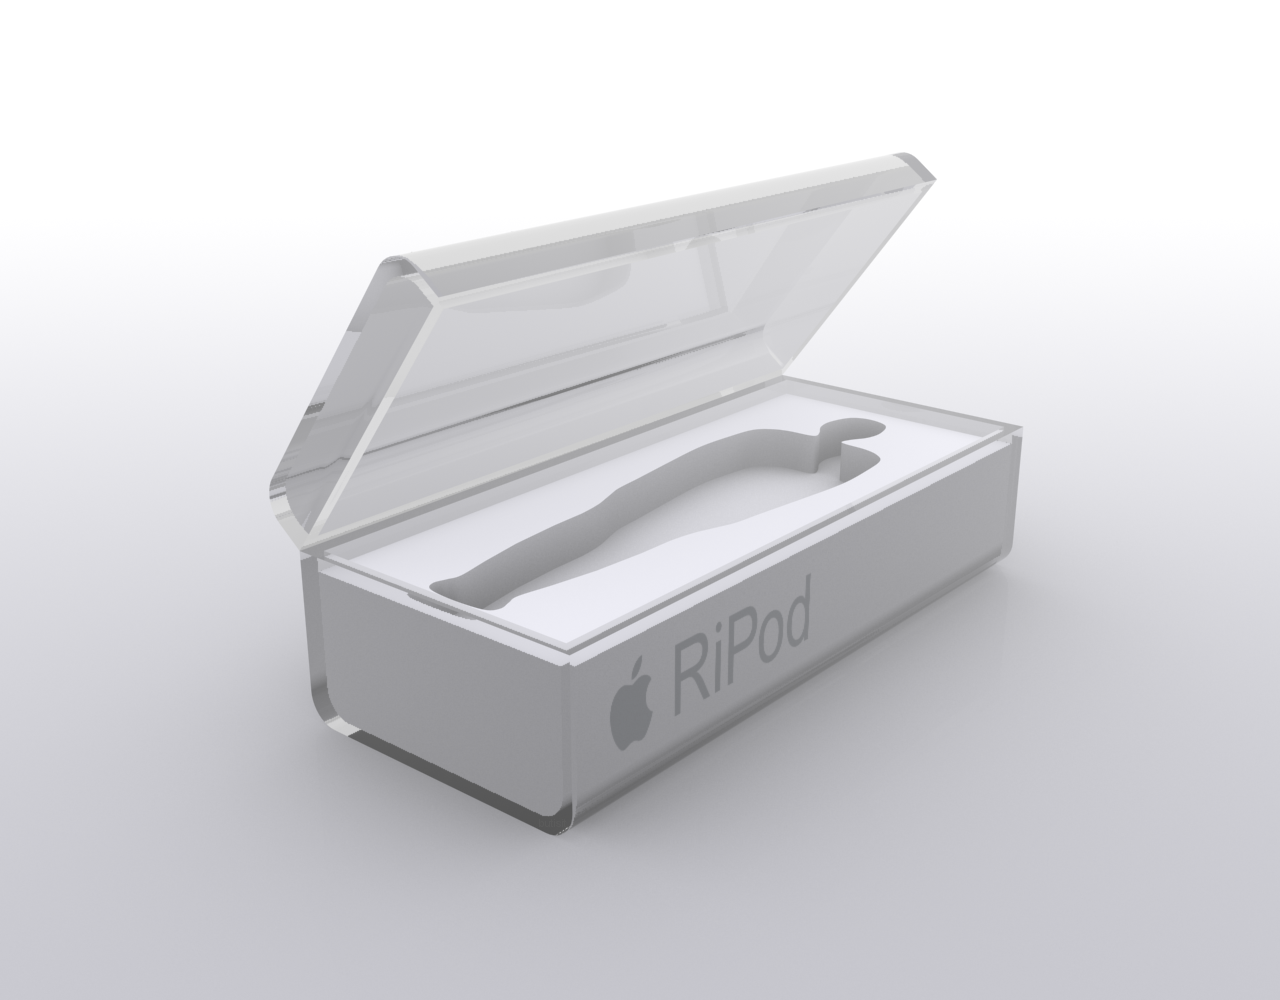 Steve Jobs RiPod by butisit